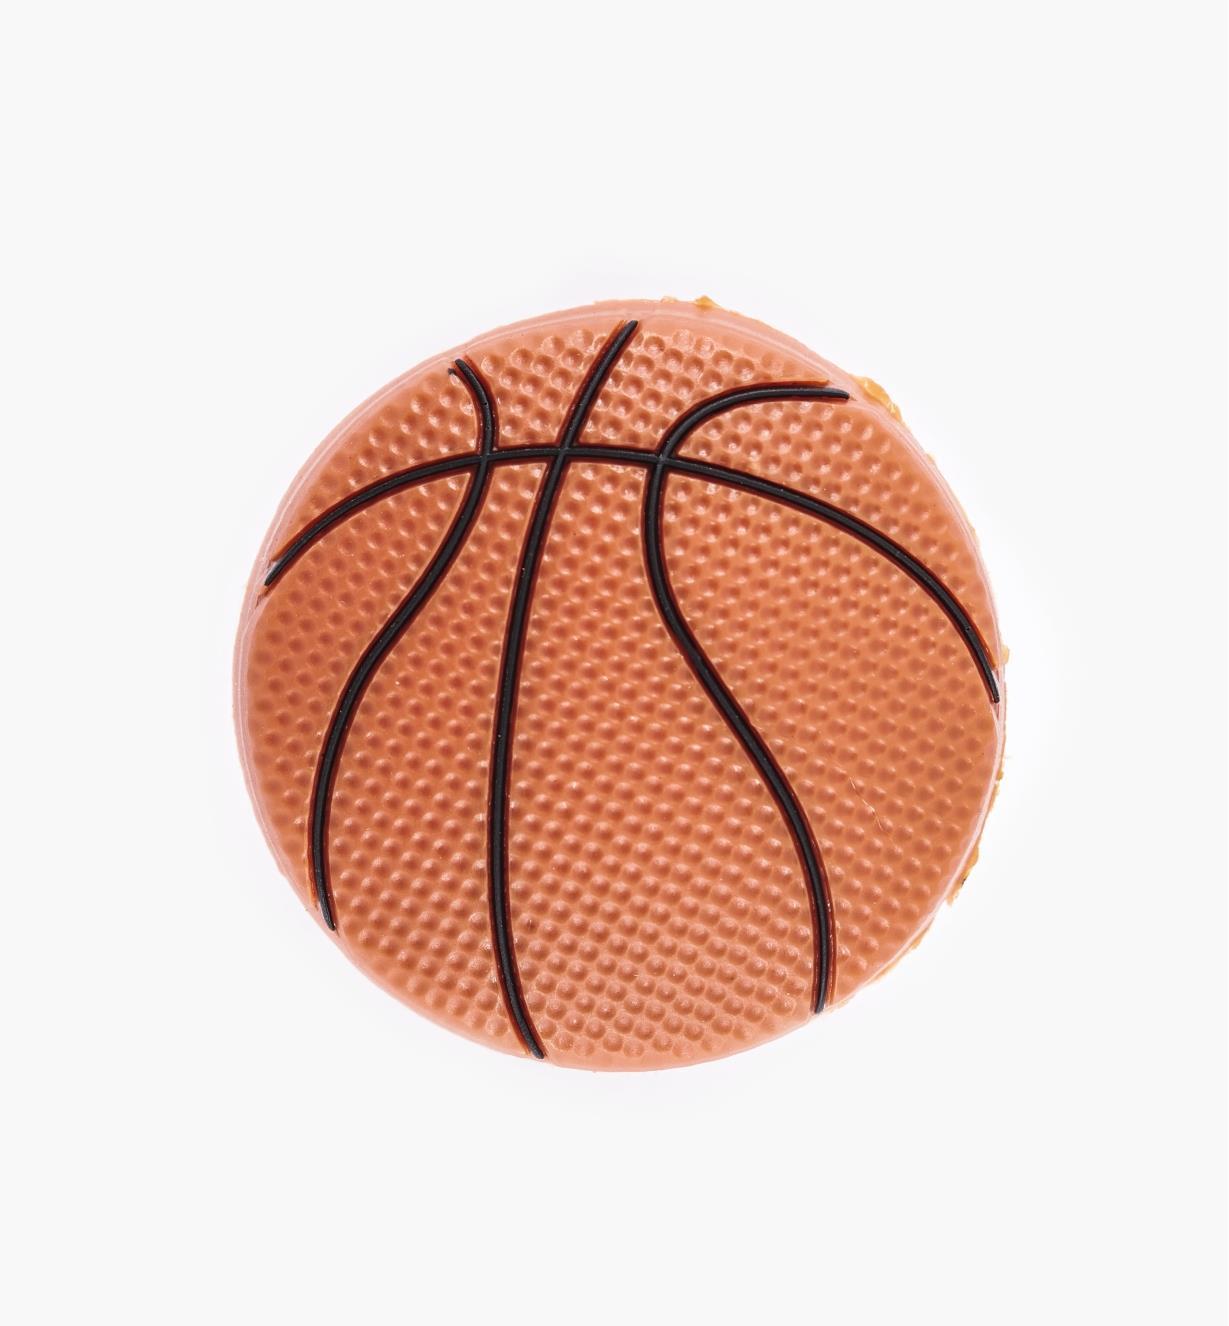 00W5610 - Basketball Knob